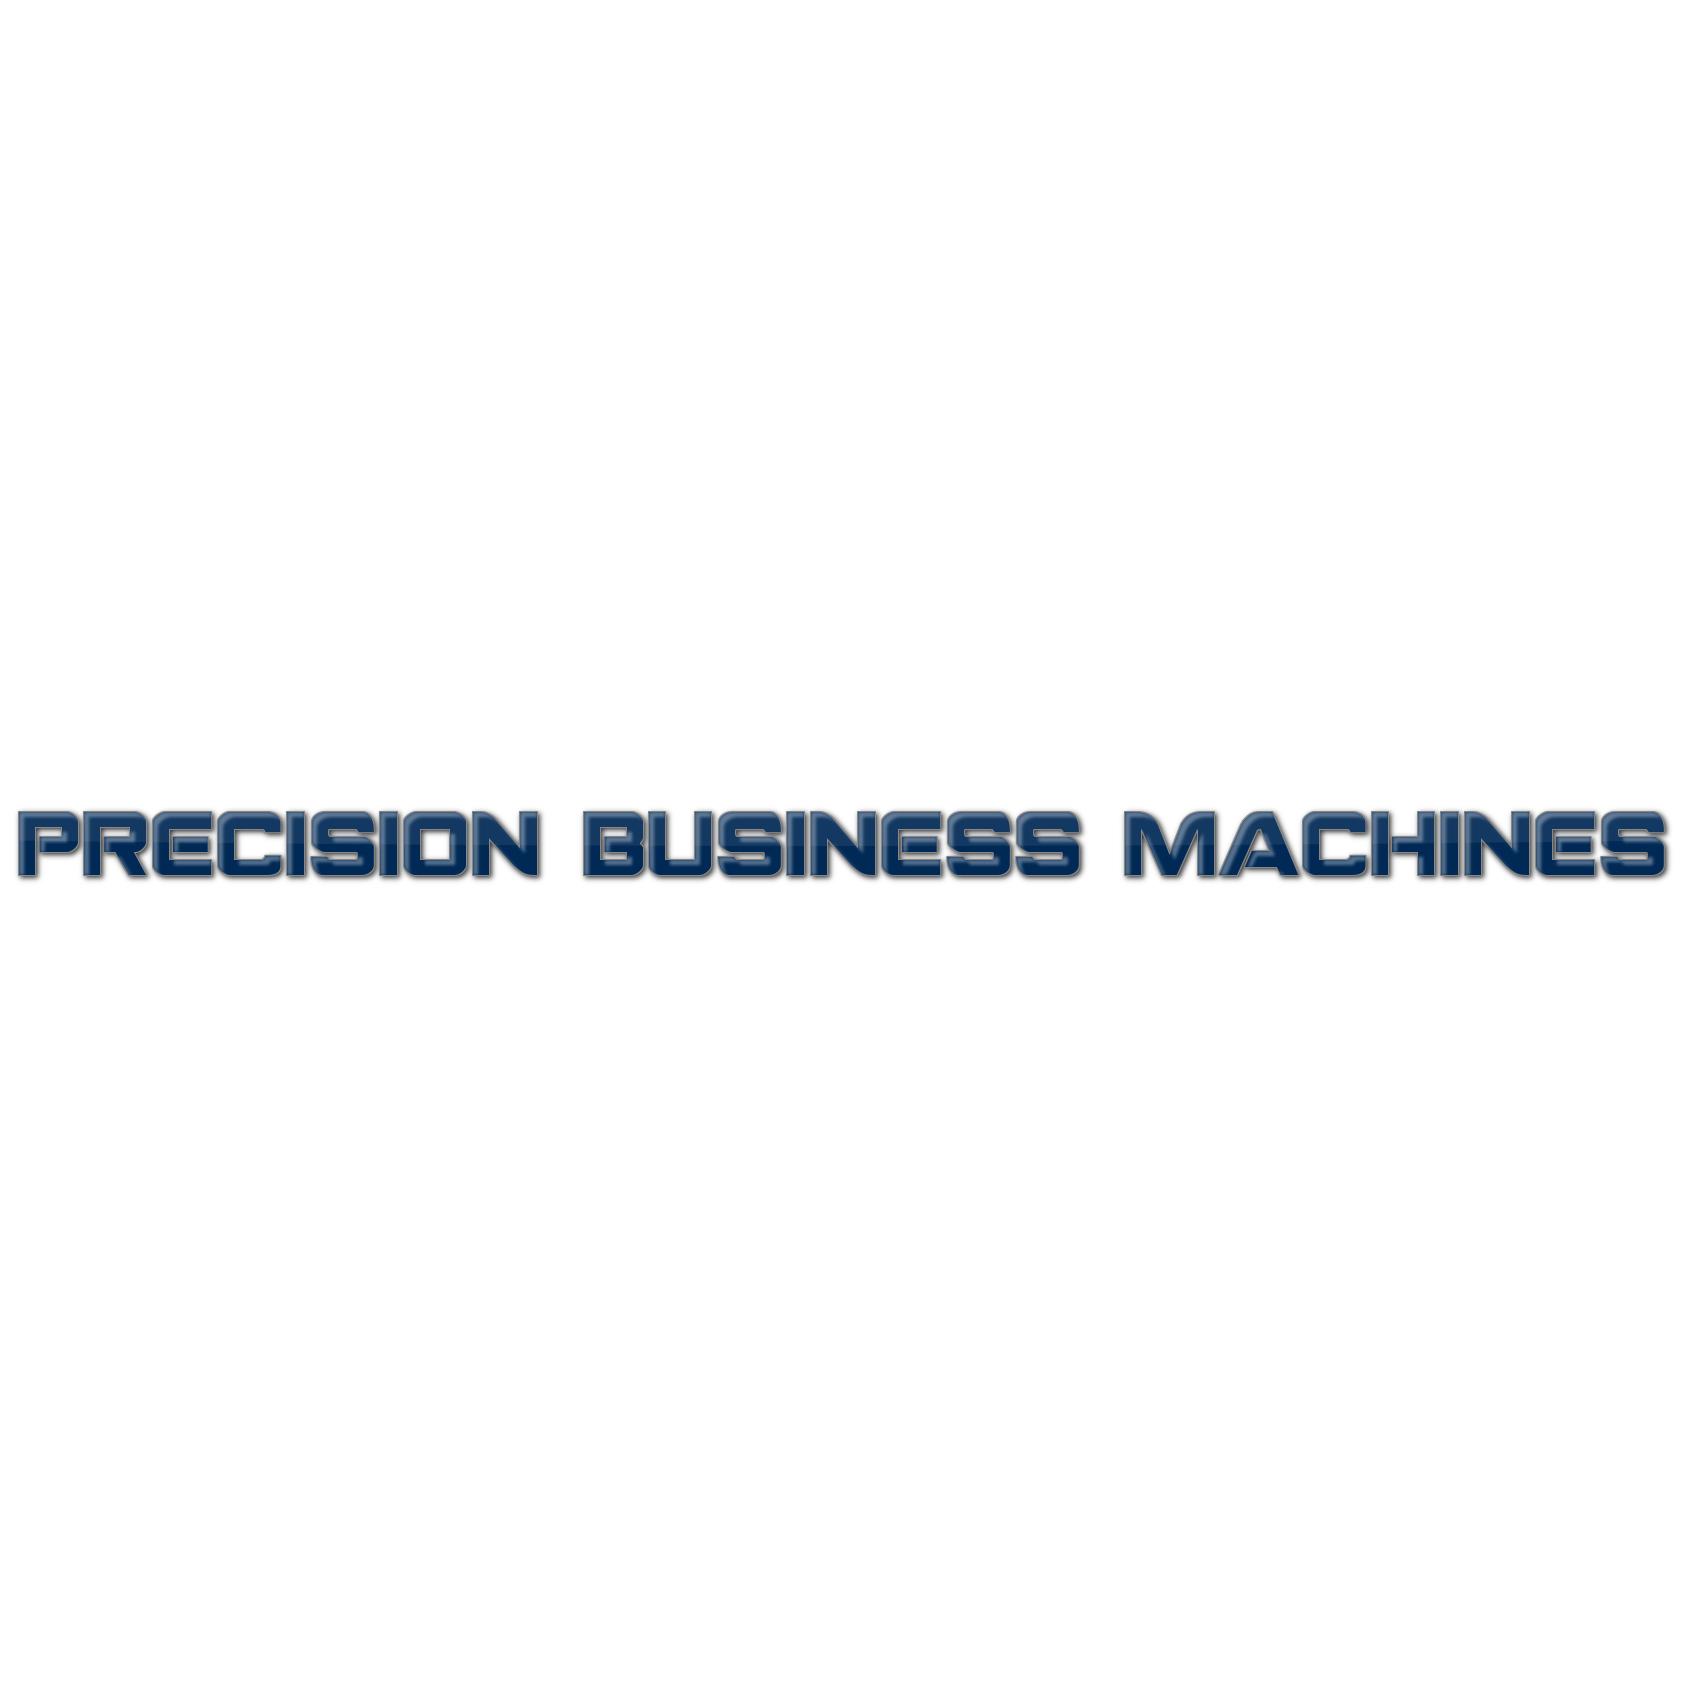 Precision Business Machines image 0